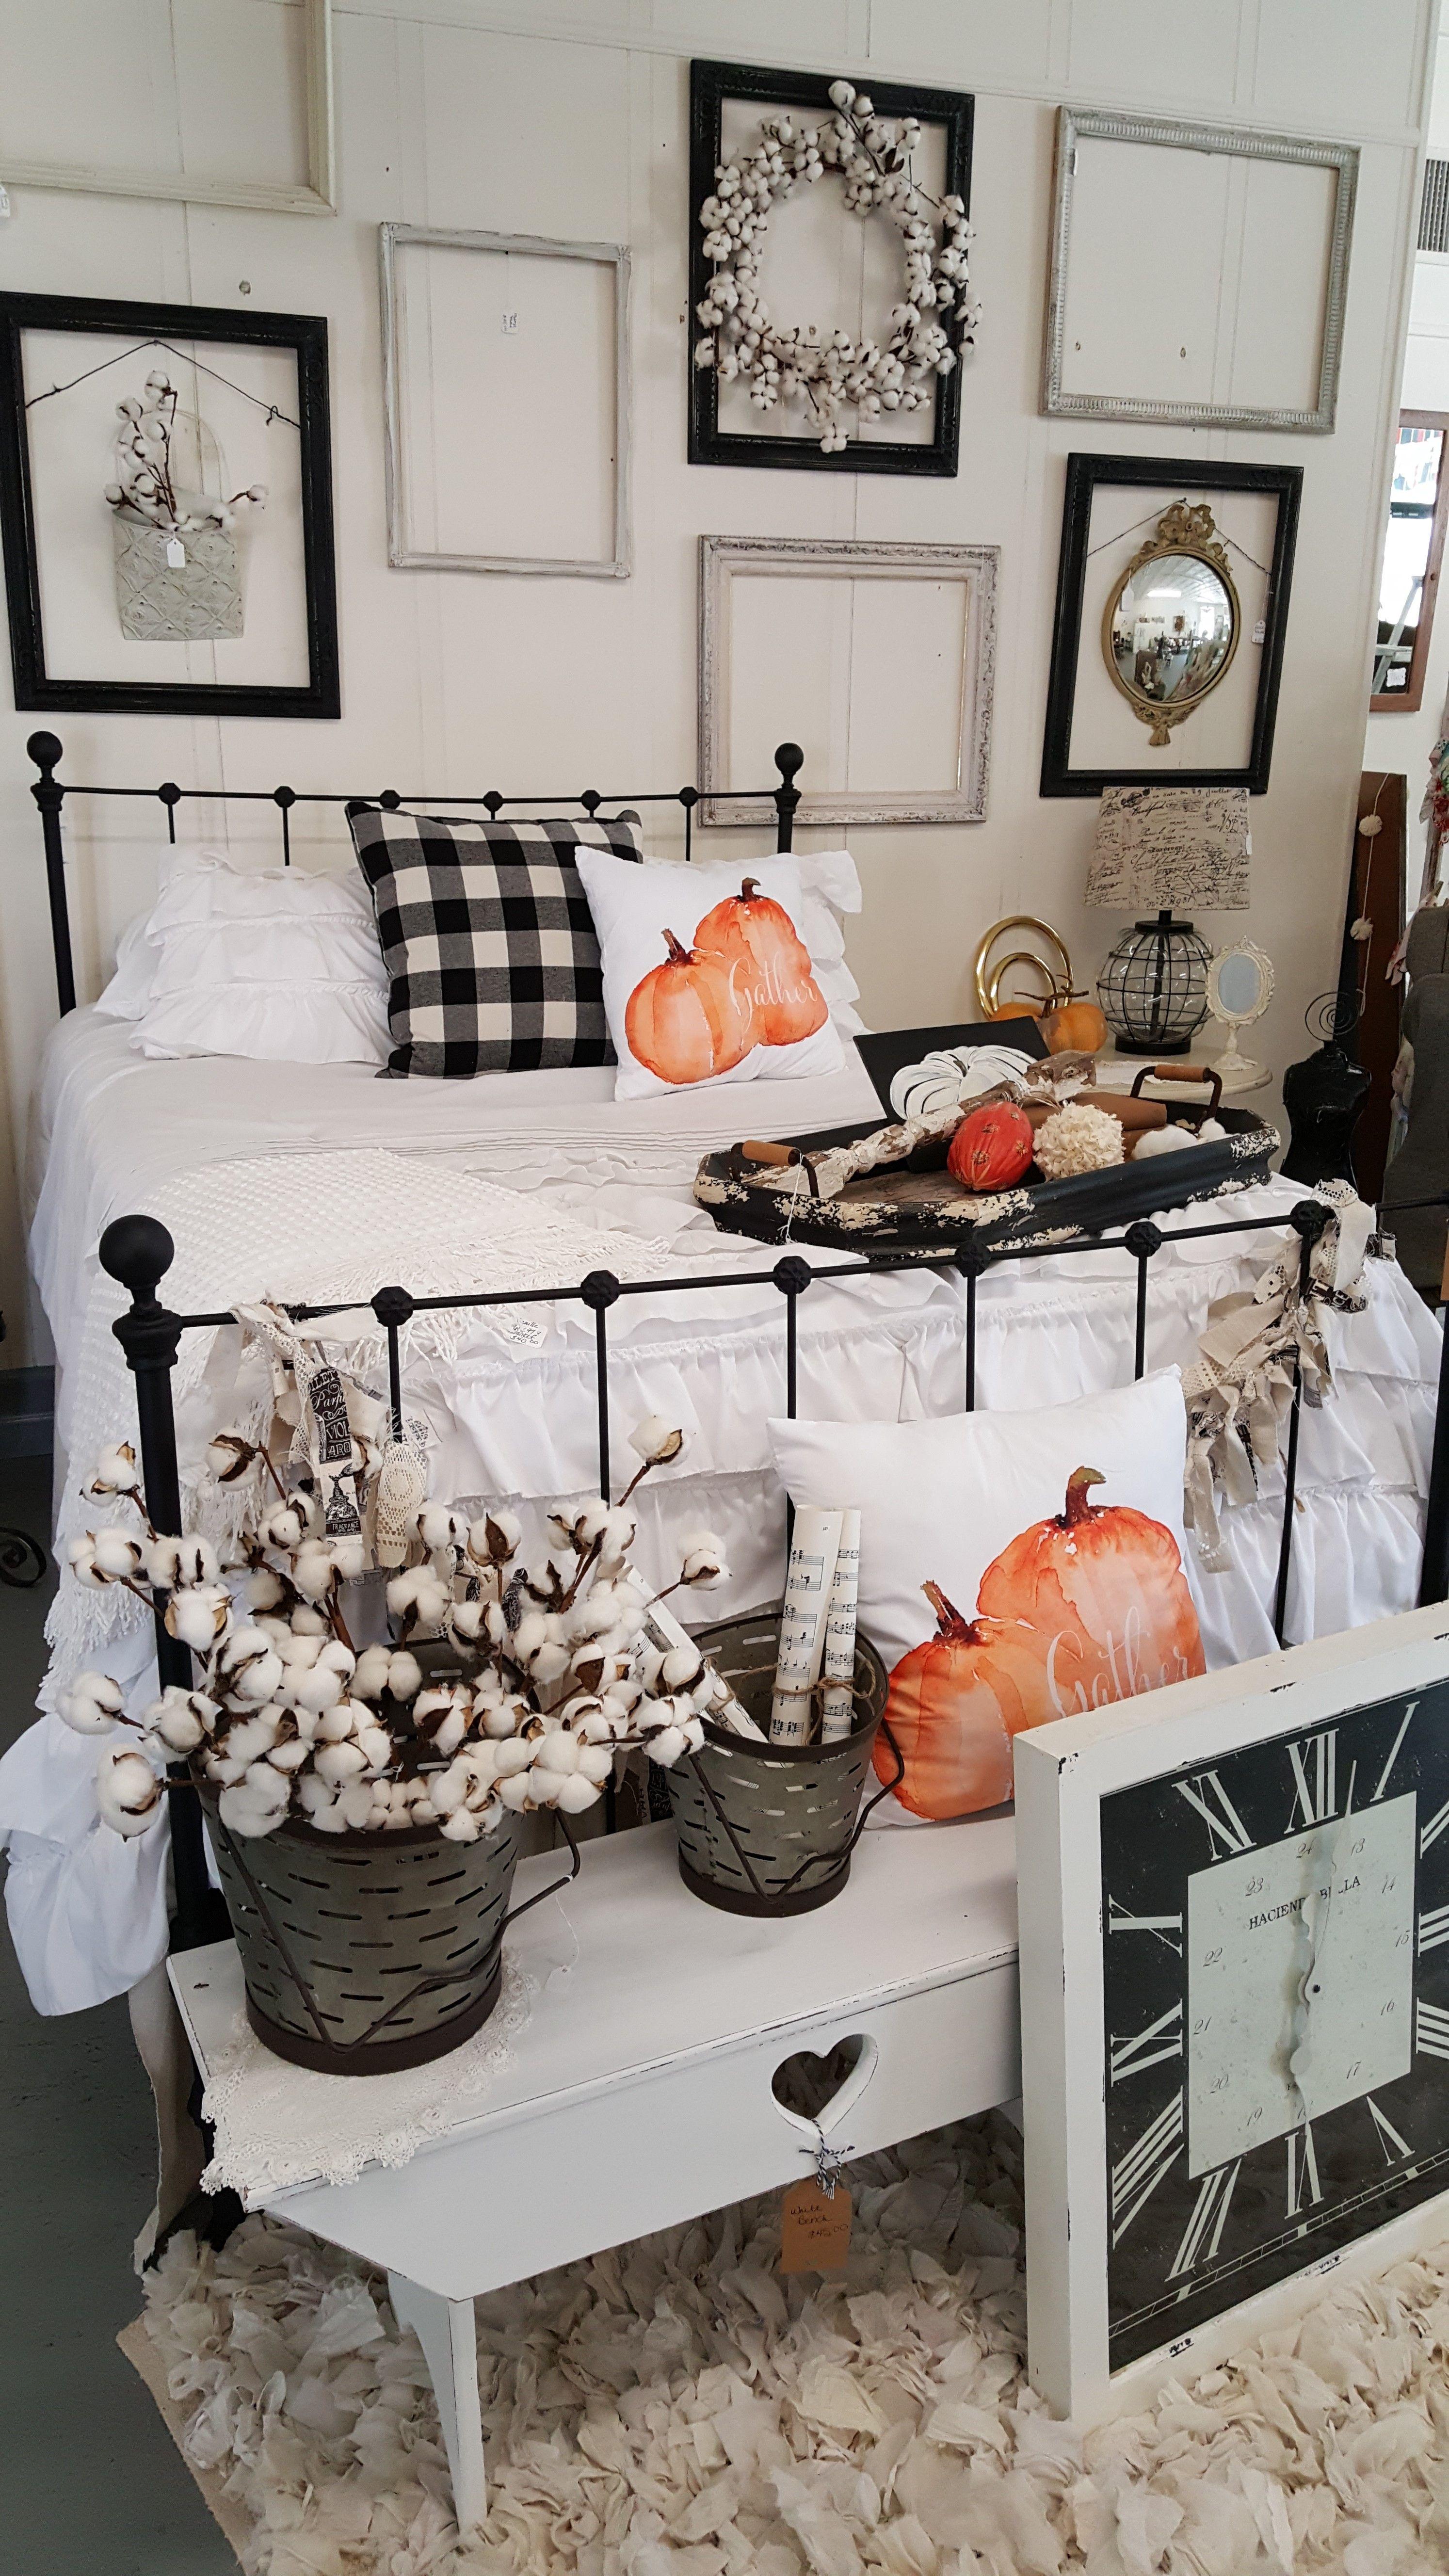 Fall Decorating For Shop Displays Buffalo Check Pillows